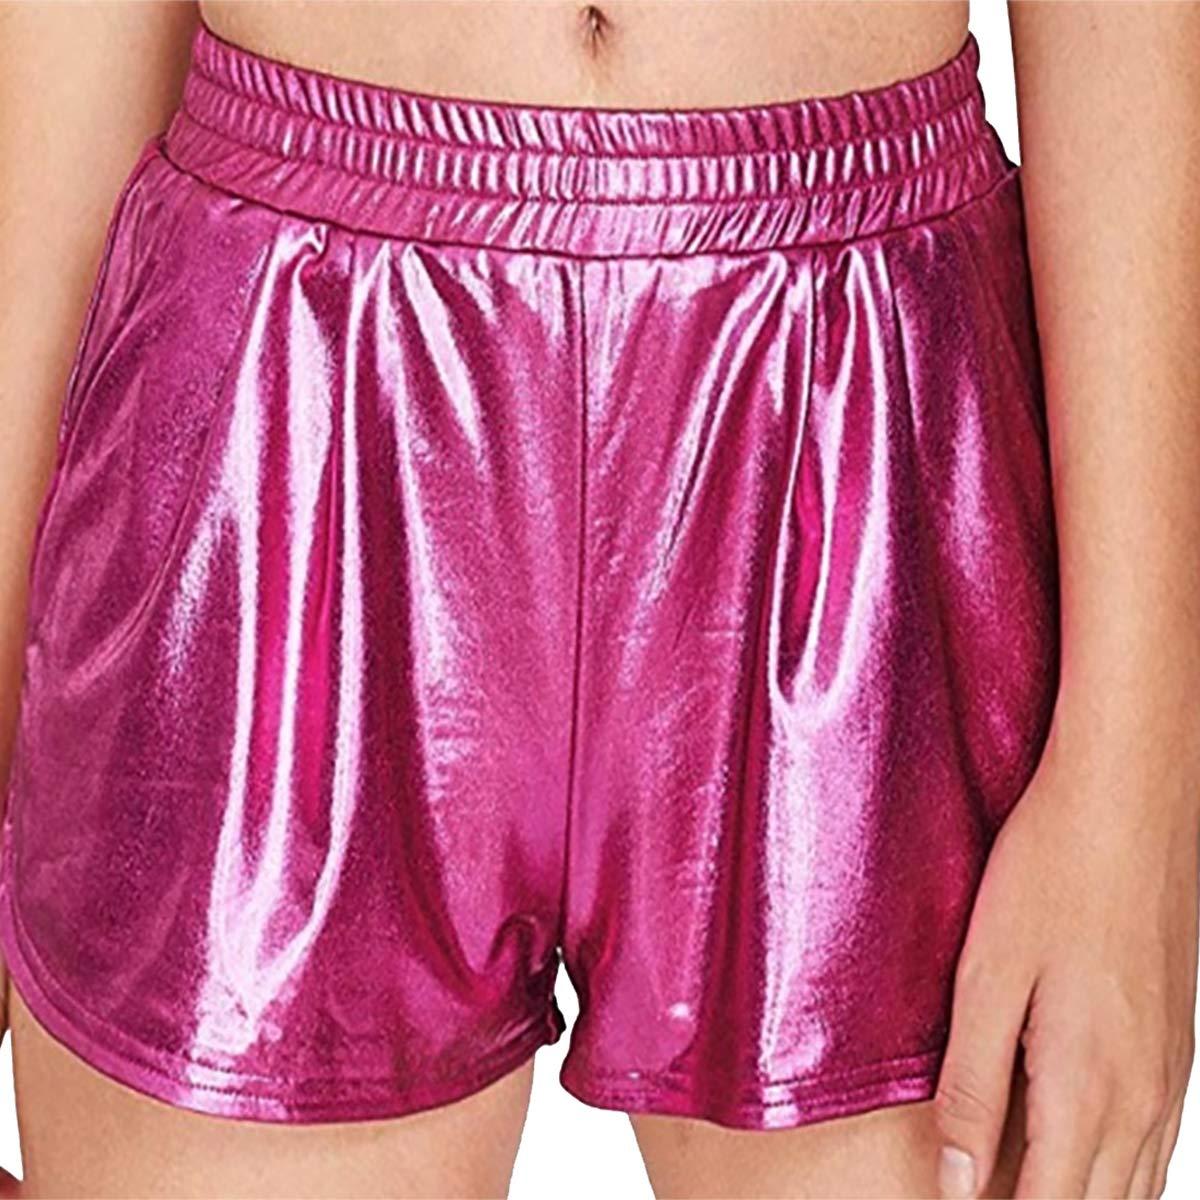 FYMNSI Womens Shiny Metallic Yoga Hot Shorts Casual Loose Elastic Waist Pants with Side Pockets